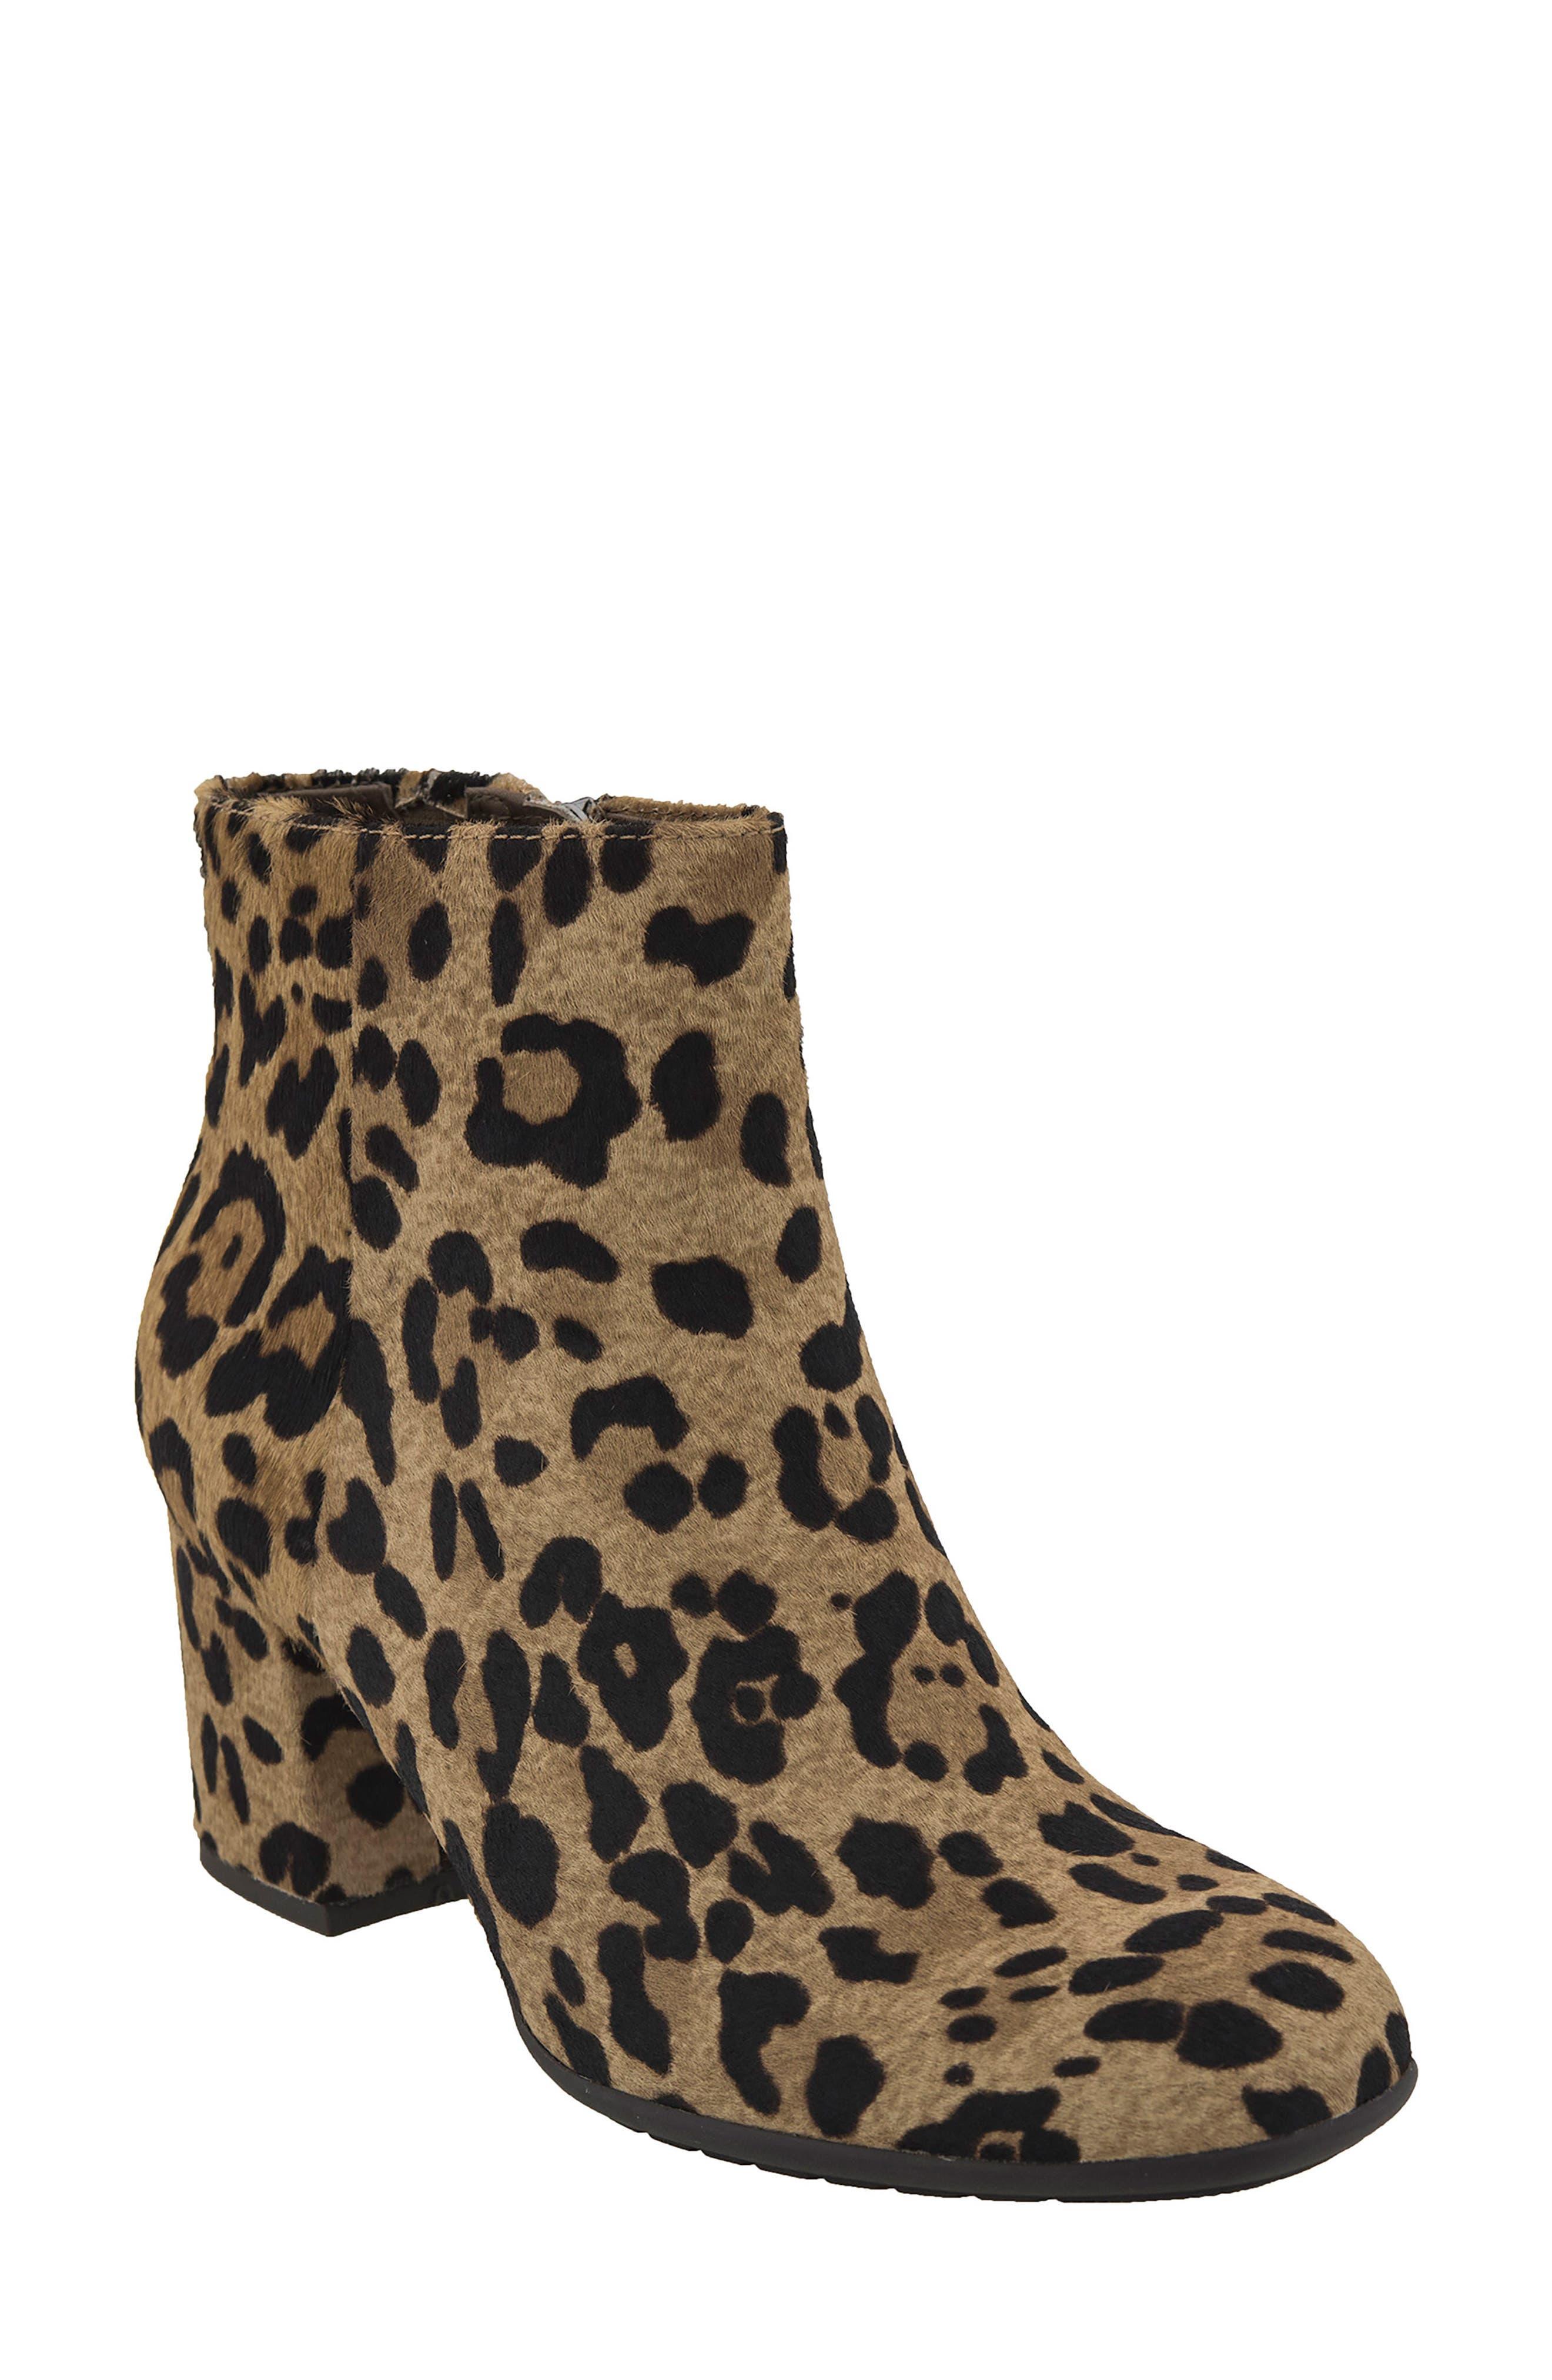 Apollo Bootie,                         Main,                         color, Leopard Print Calfhair